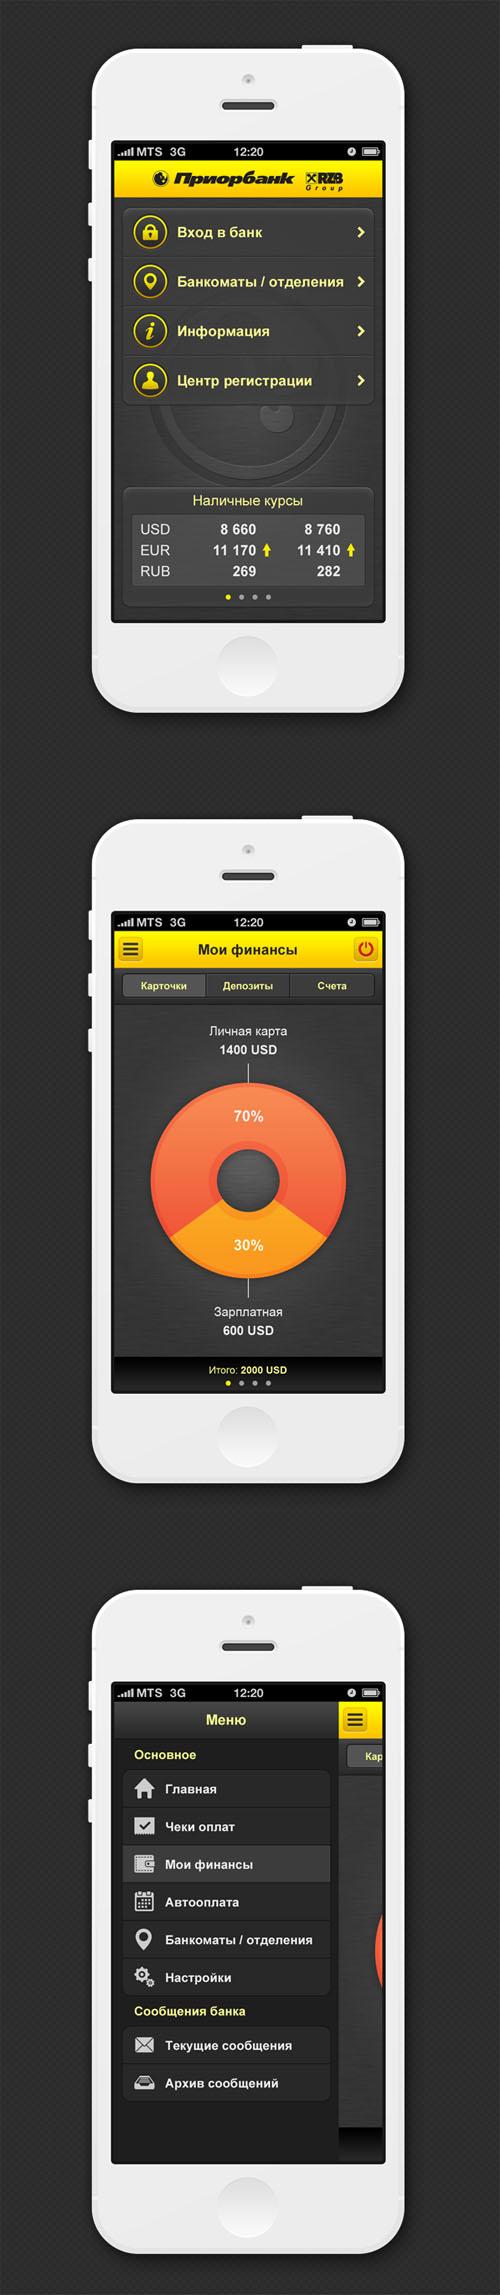 GUI for Mobile App UI UX Design for Inspiration